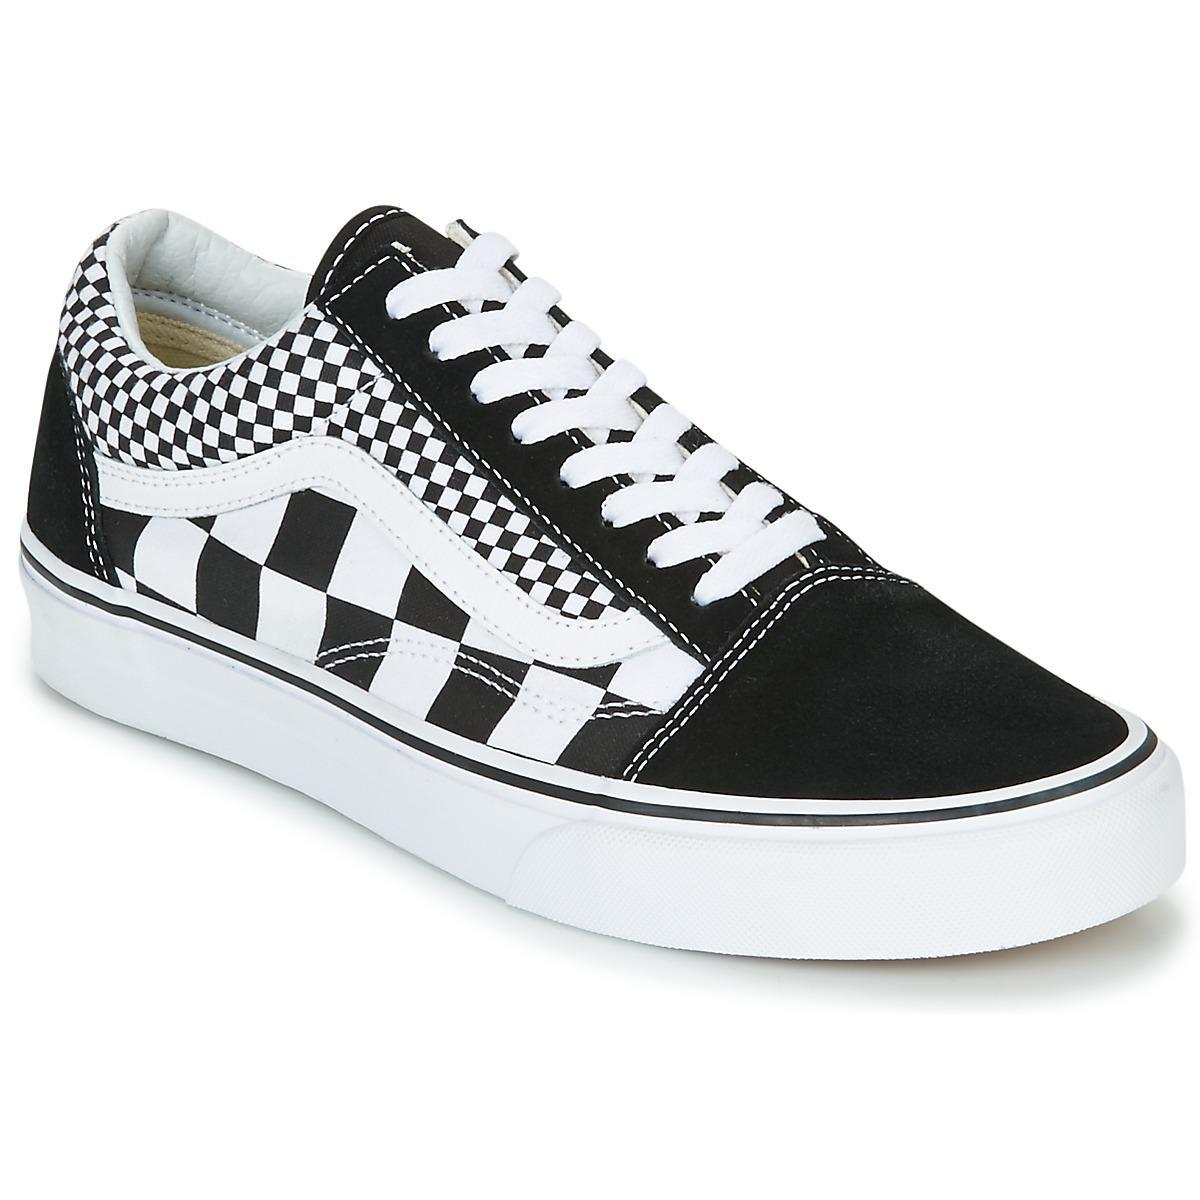 e4046794ac47 Black Vans Women s Skool Lyst Shoes Old In trainers YFaP4xY